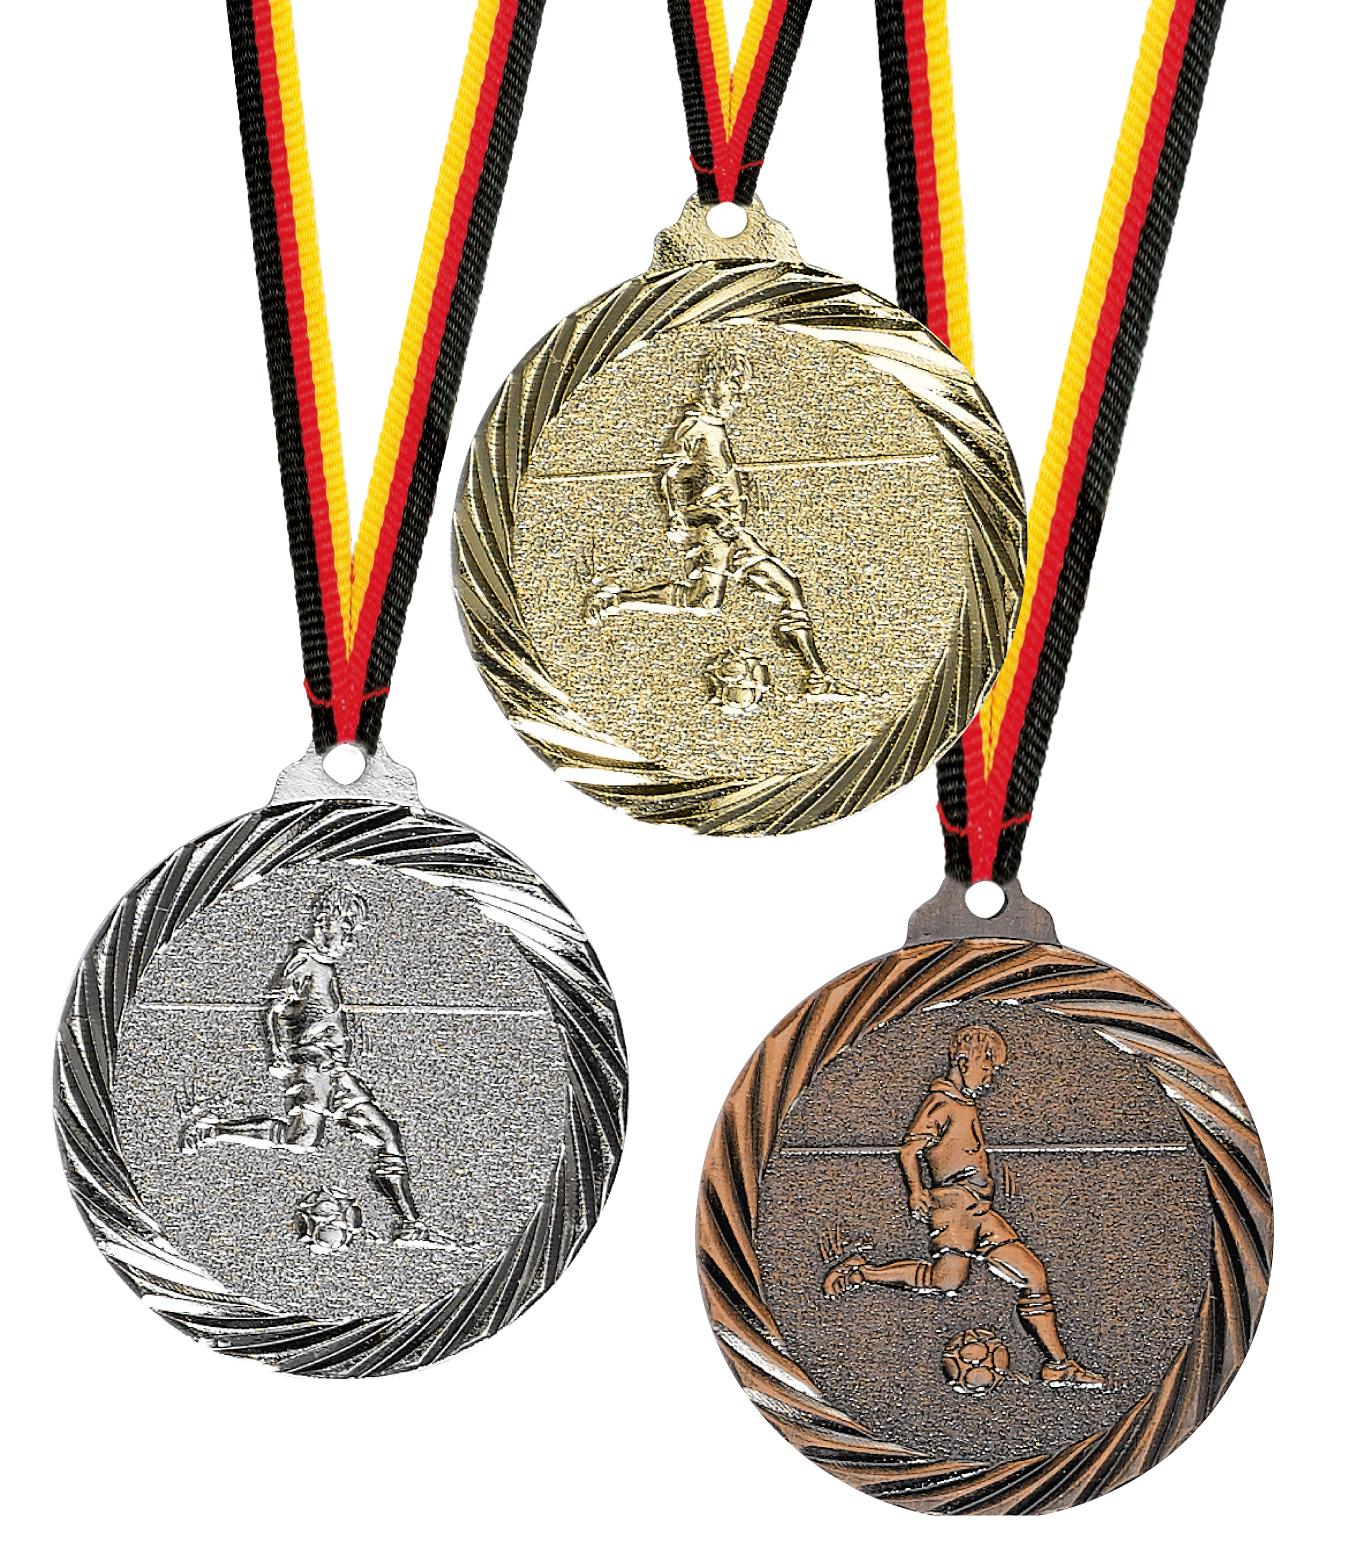 Fußballmedaille Metall geprägt 32mmØ Medaillen Premium hochwertig edel